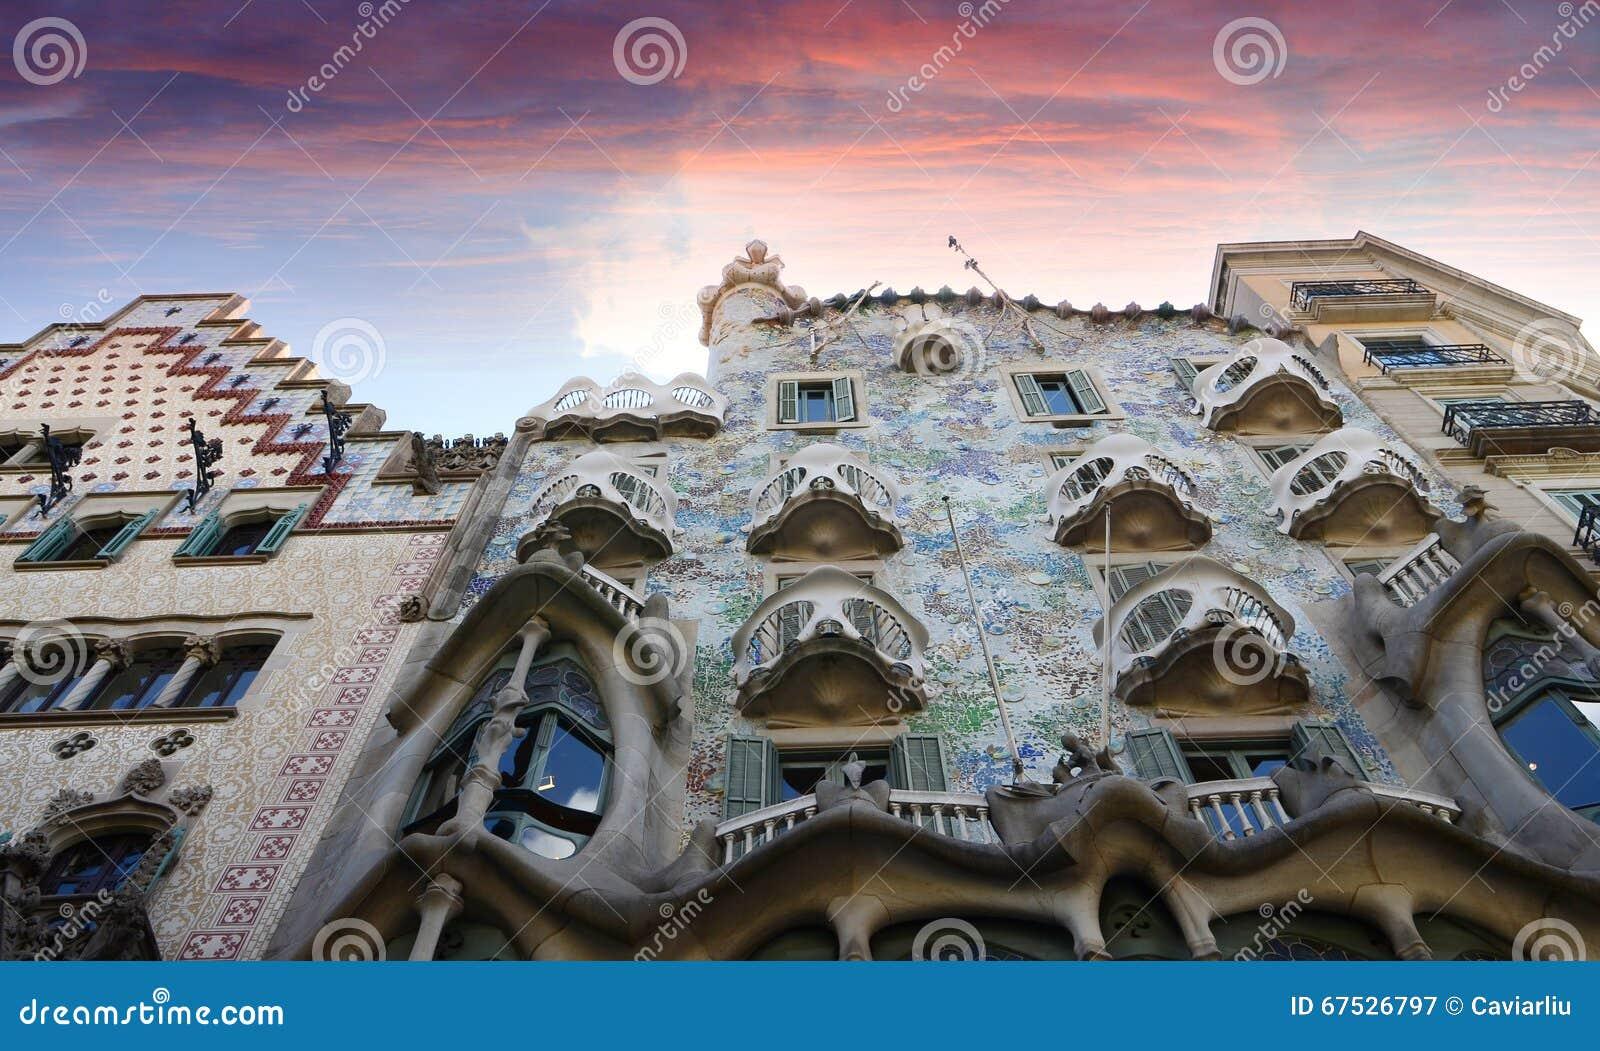 The famous casa Battlo building designed by Antonio Gaudi in Barcelona.